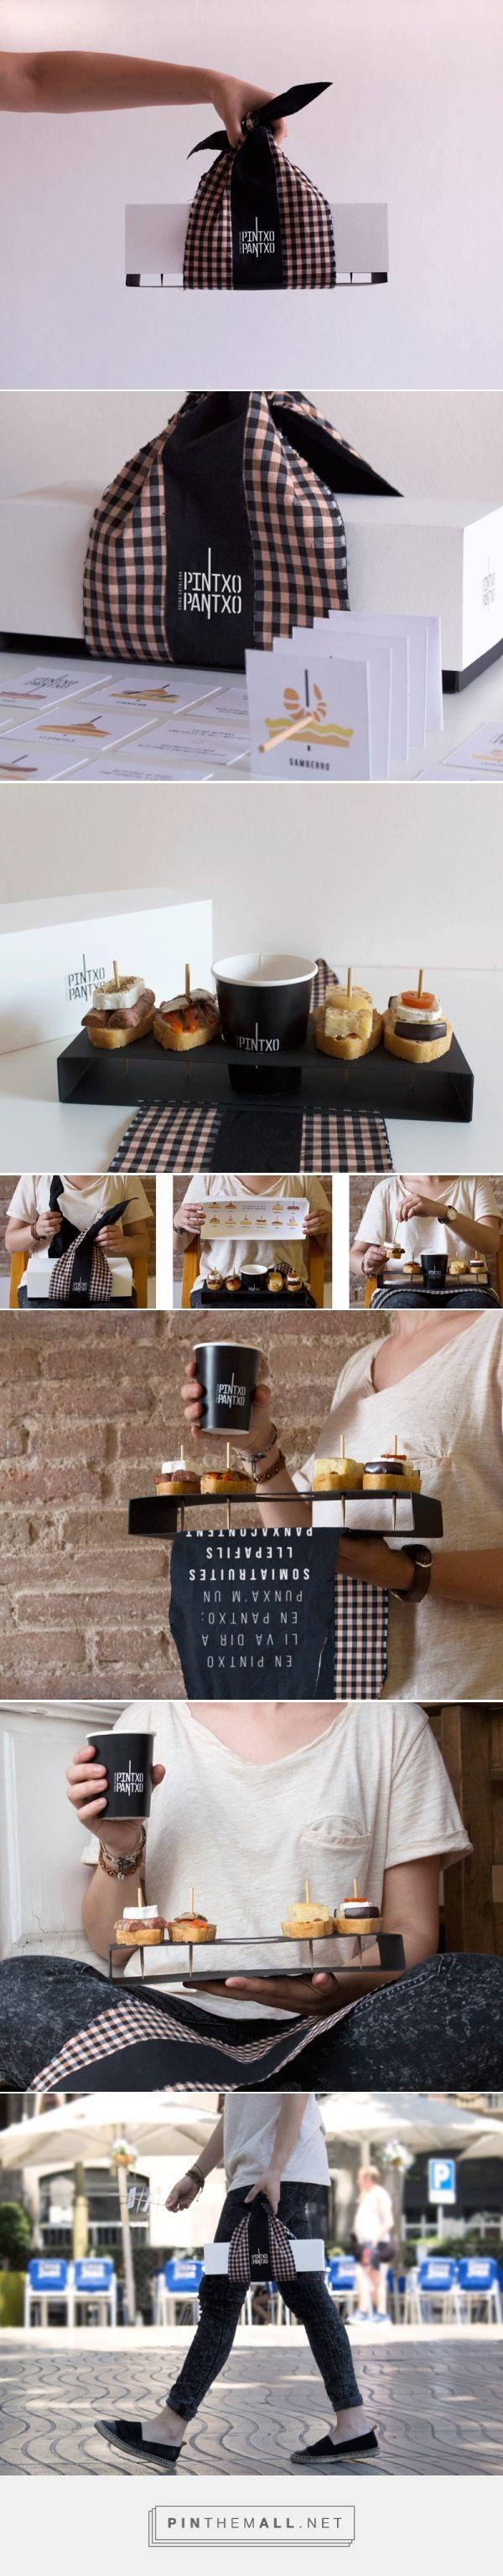 restaurants inspiration / branding | PINTXO PANTXO Más